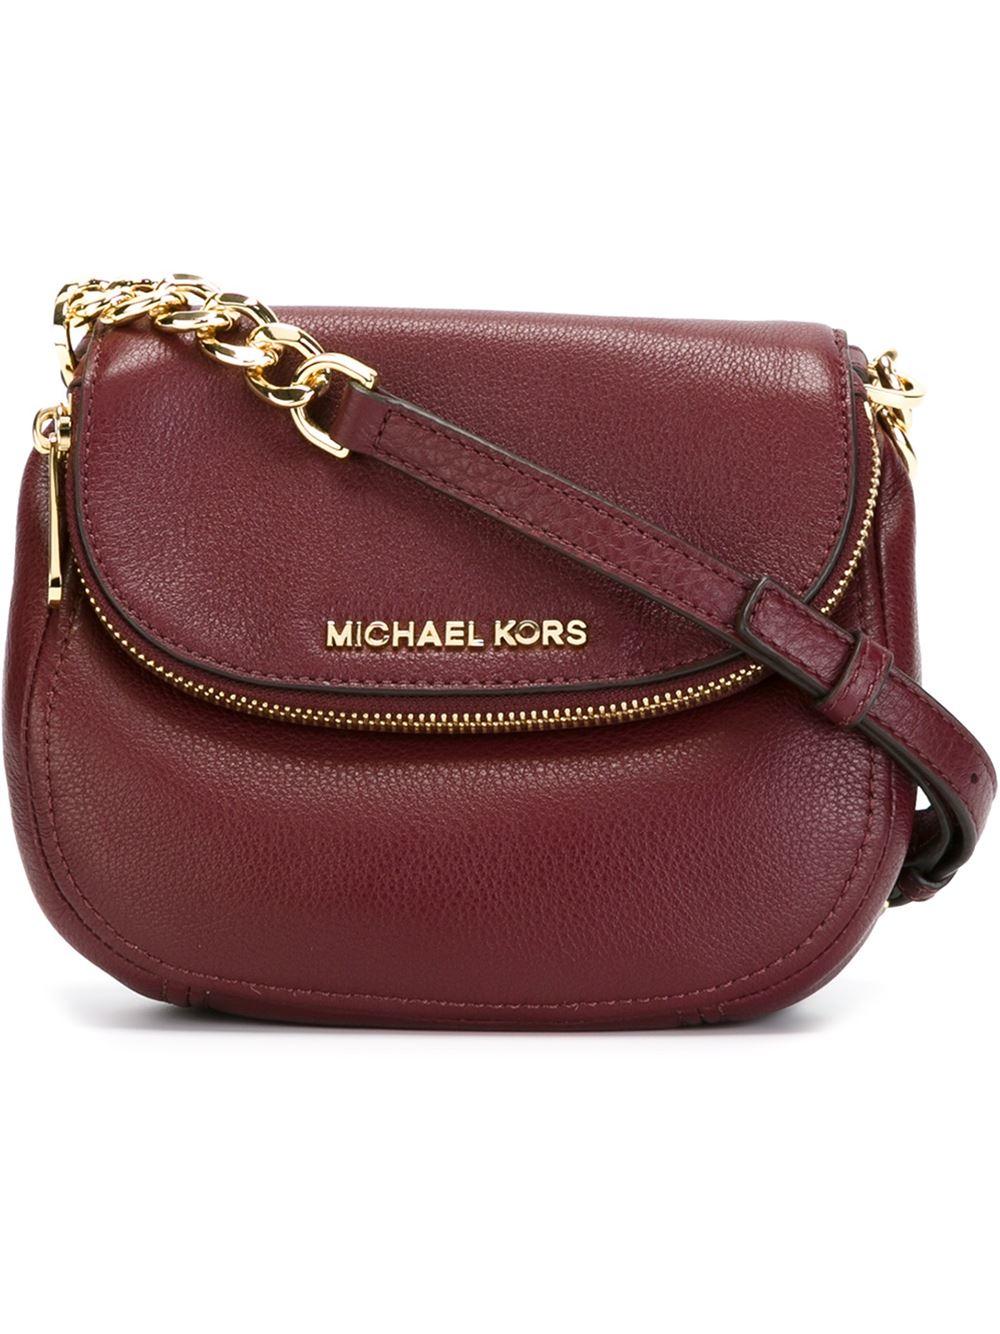 911c0e8c393a MICHAEL Michael Kors Zipped Fold Over Top Cross Body Bag in Purple ...